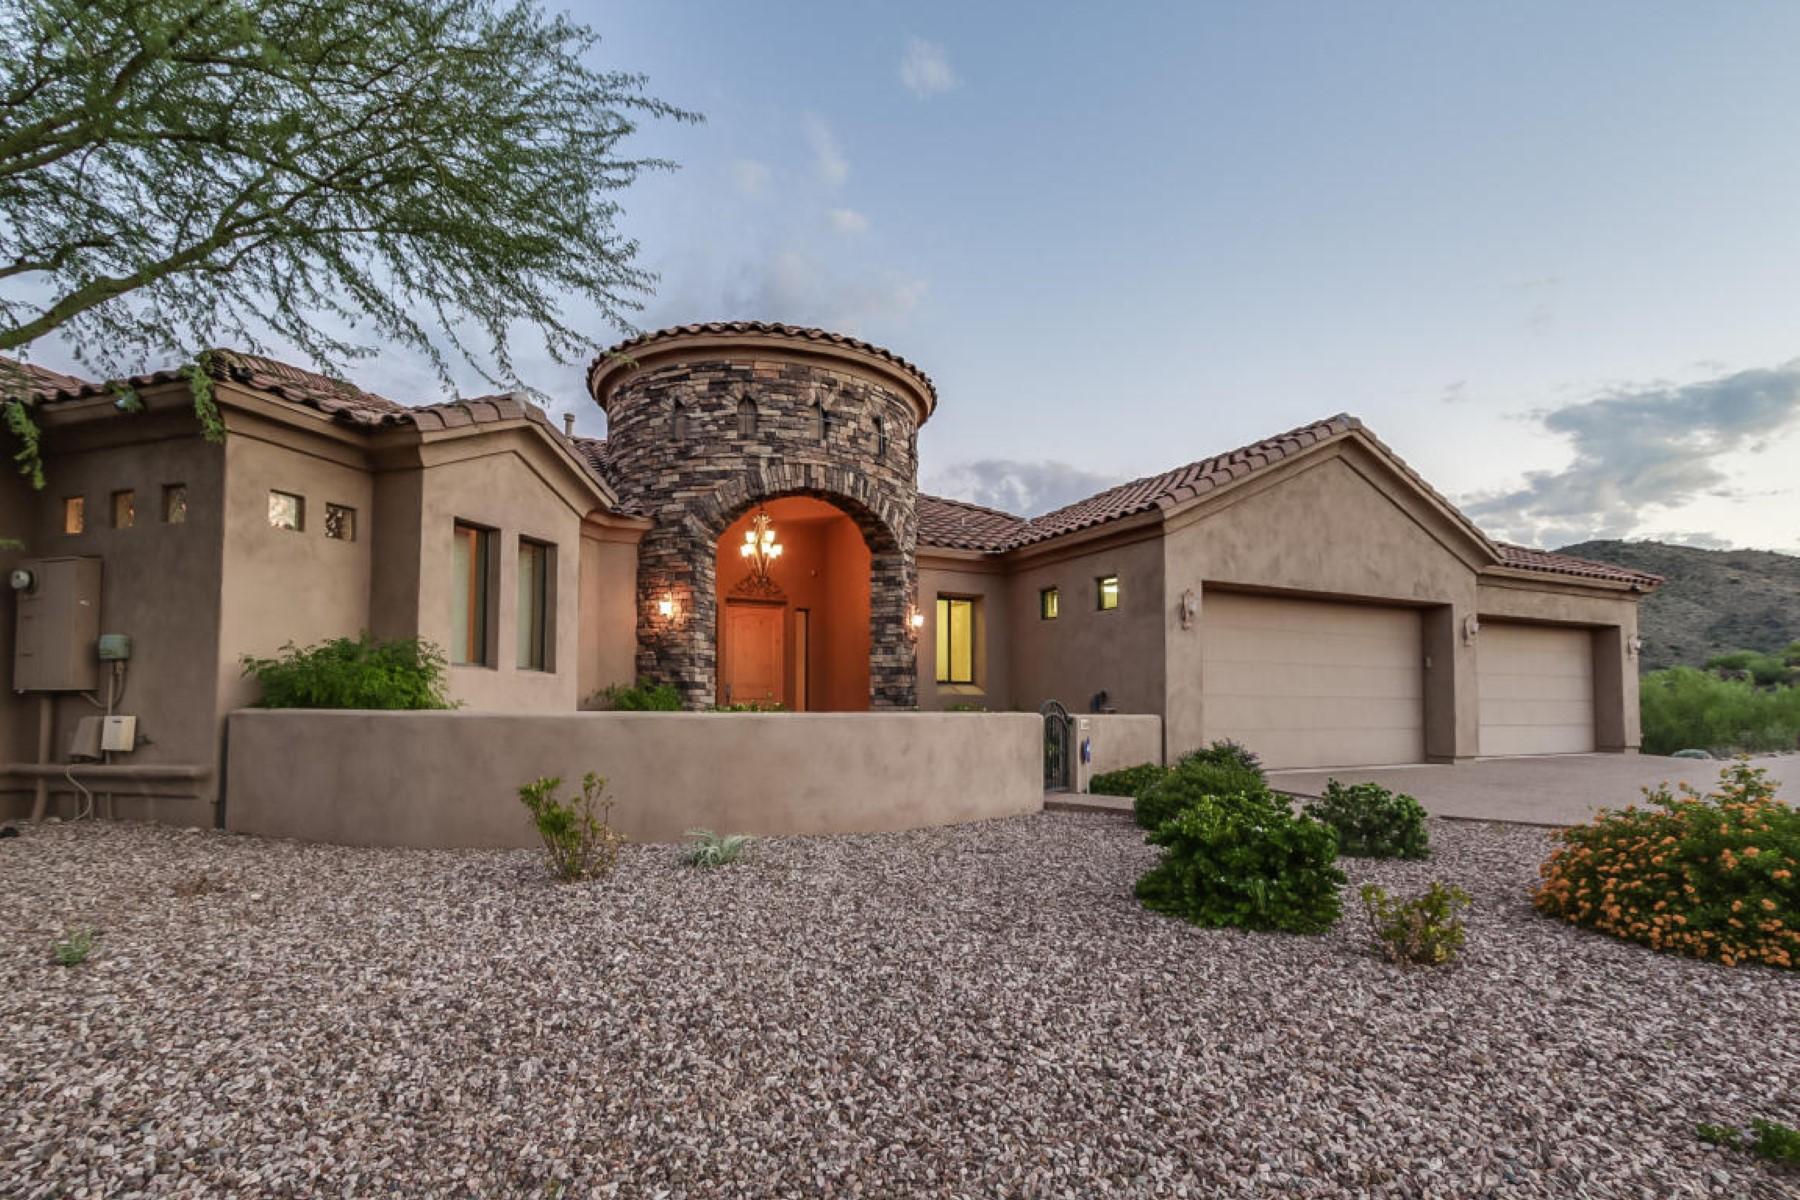 Single Family Home for Sale at Custom home on a premier street of Sunridge Canyon 15405 E Sundown Drive Fountain Hills, Arizona, 85268 United States